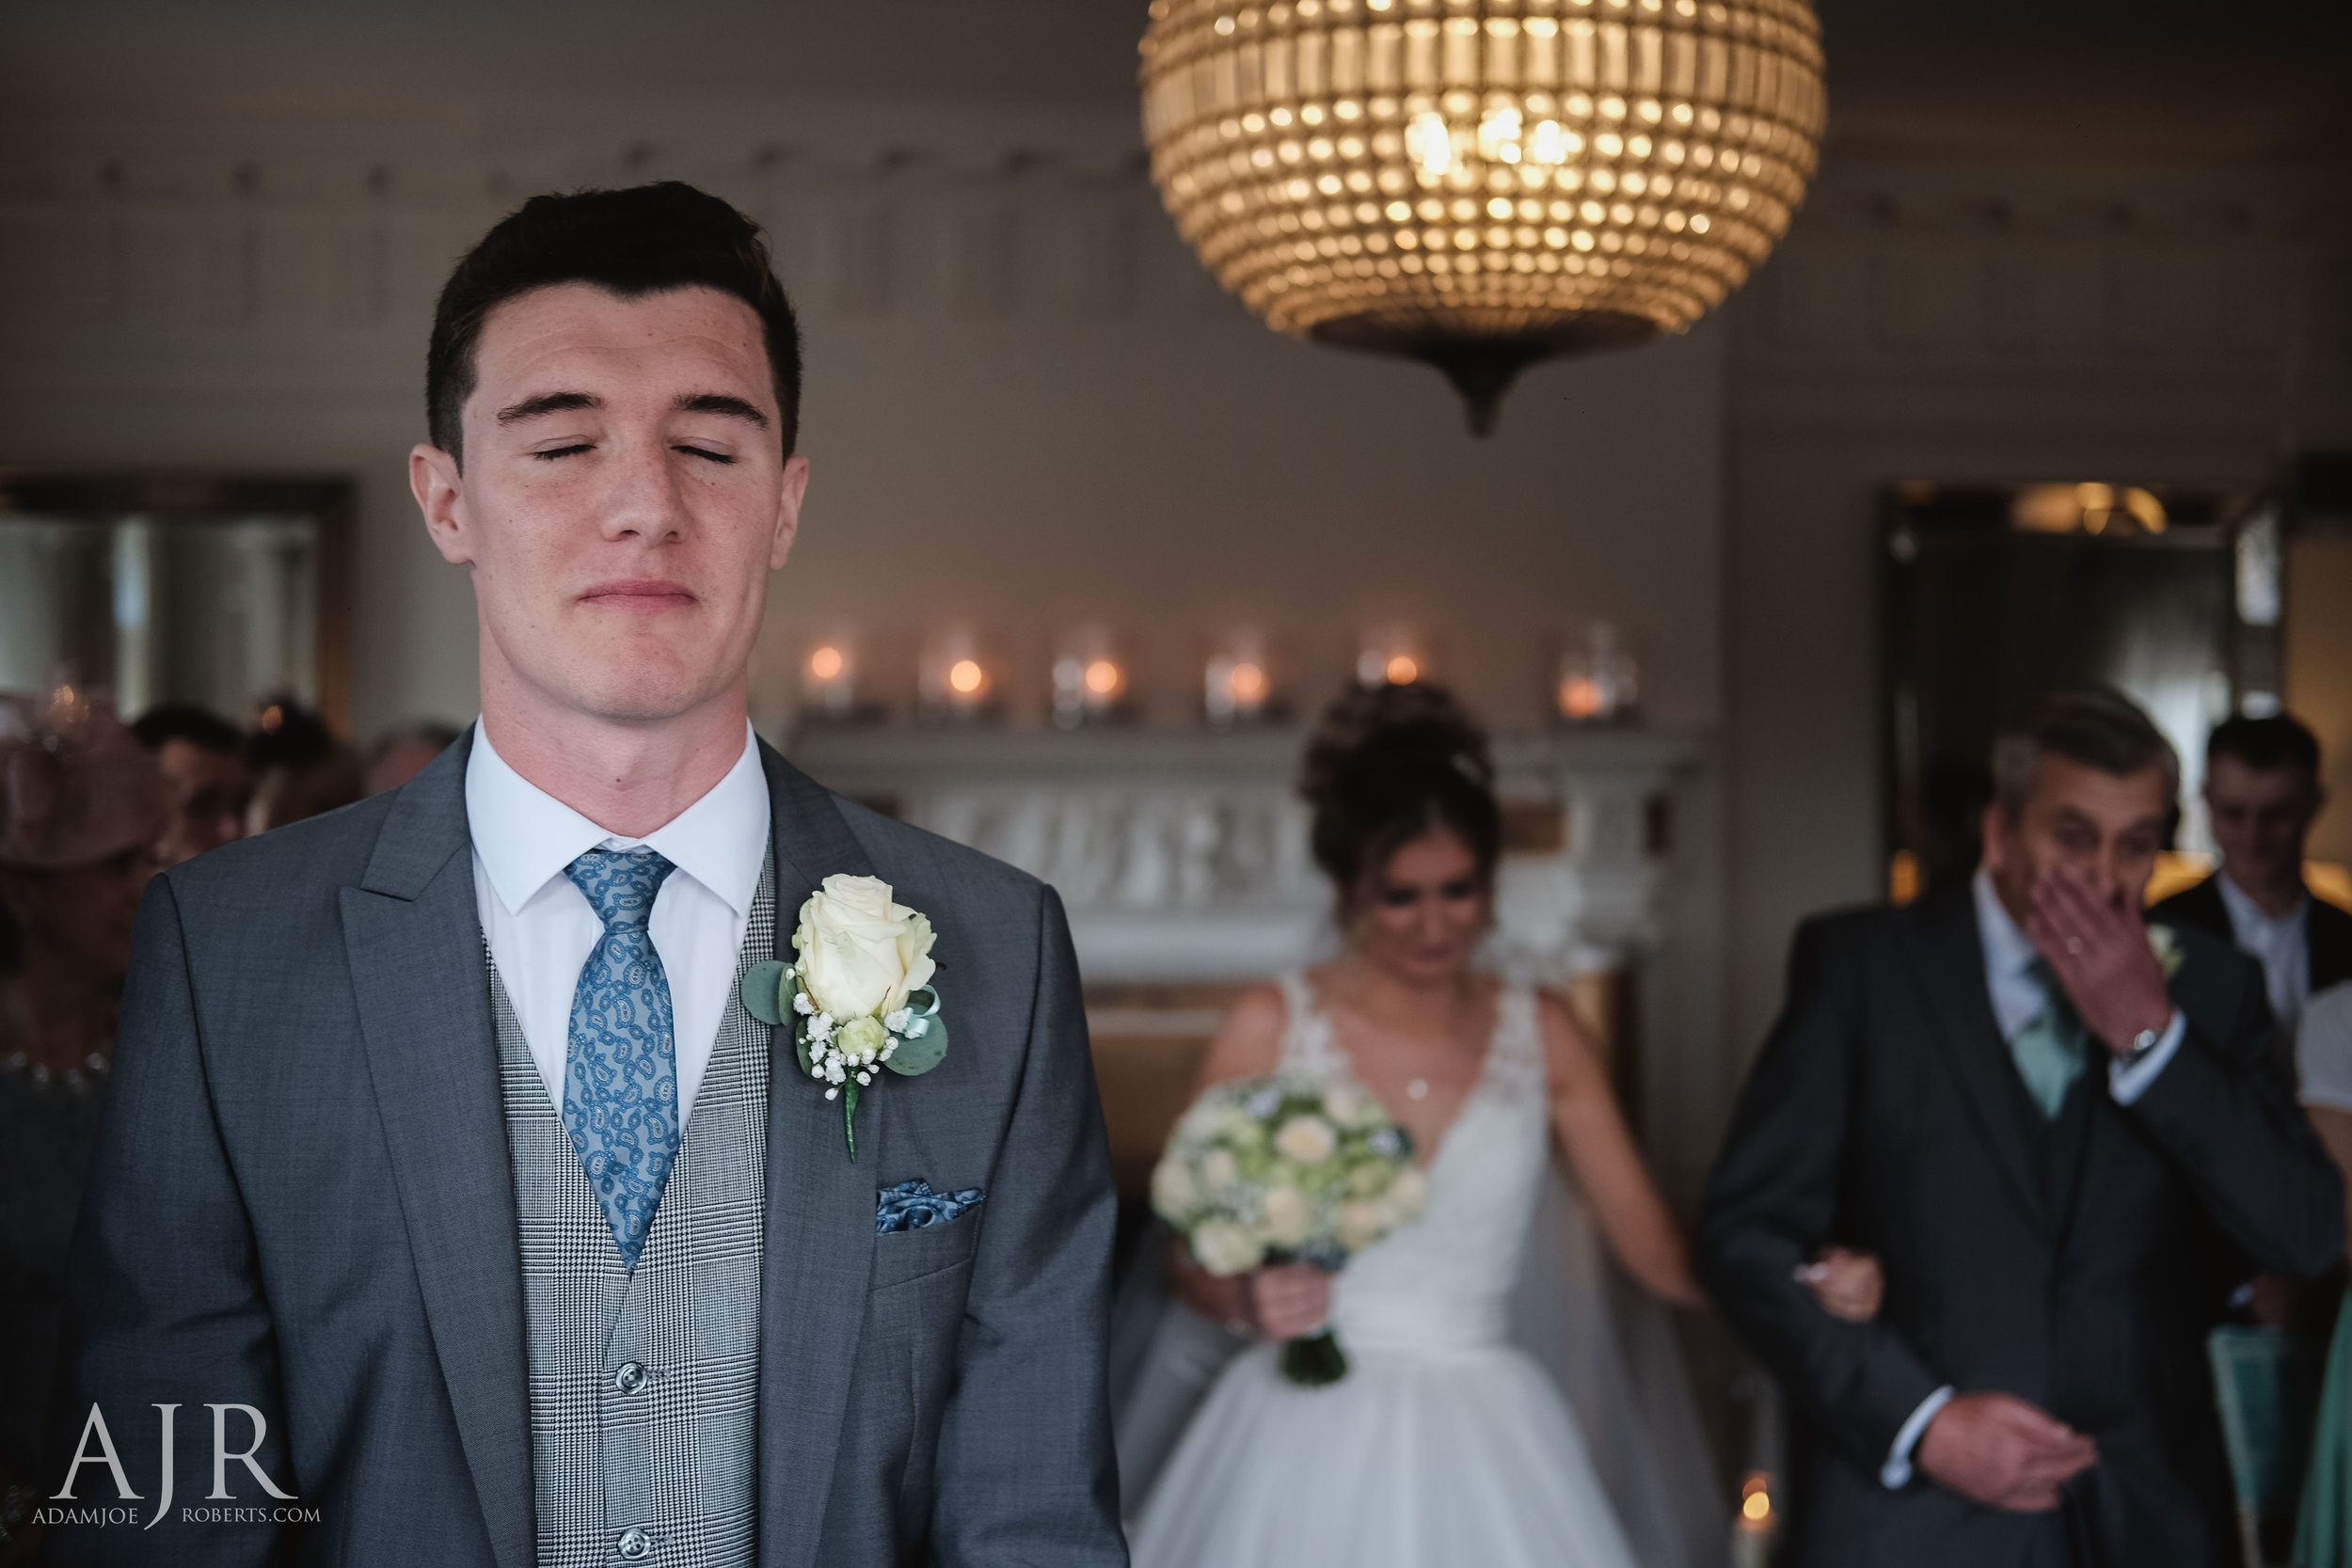 Eaves hall documenrty wedding photography | widnes cheshire wedding photographer sneak peek (3 of 11).jpg